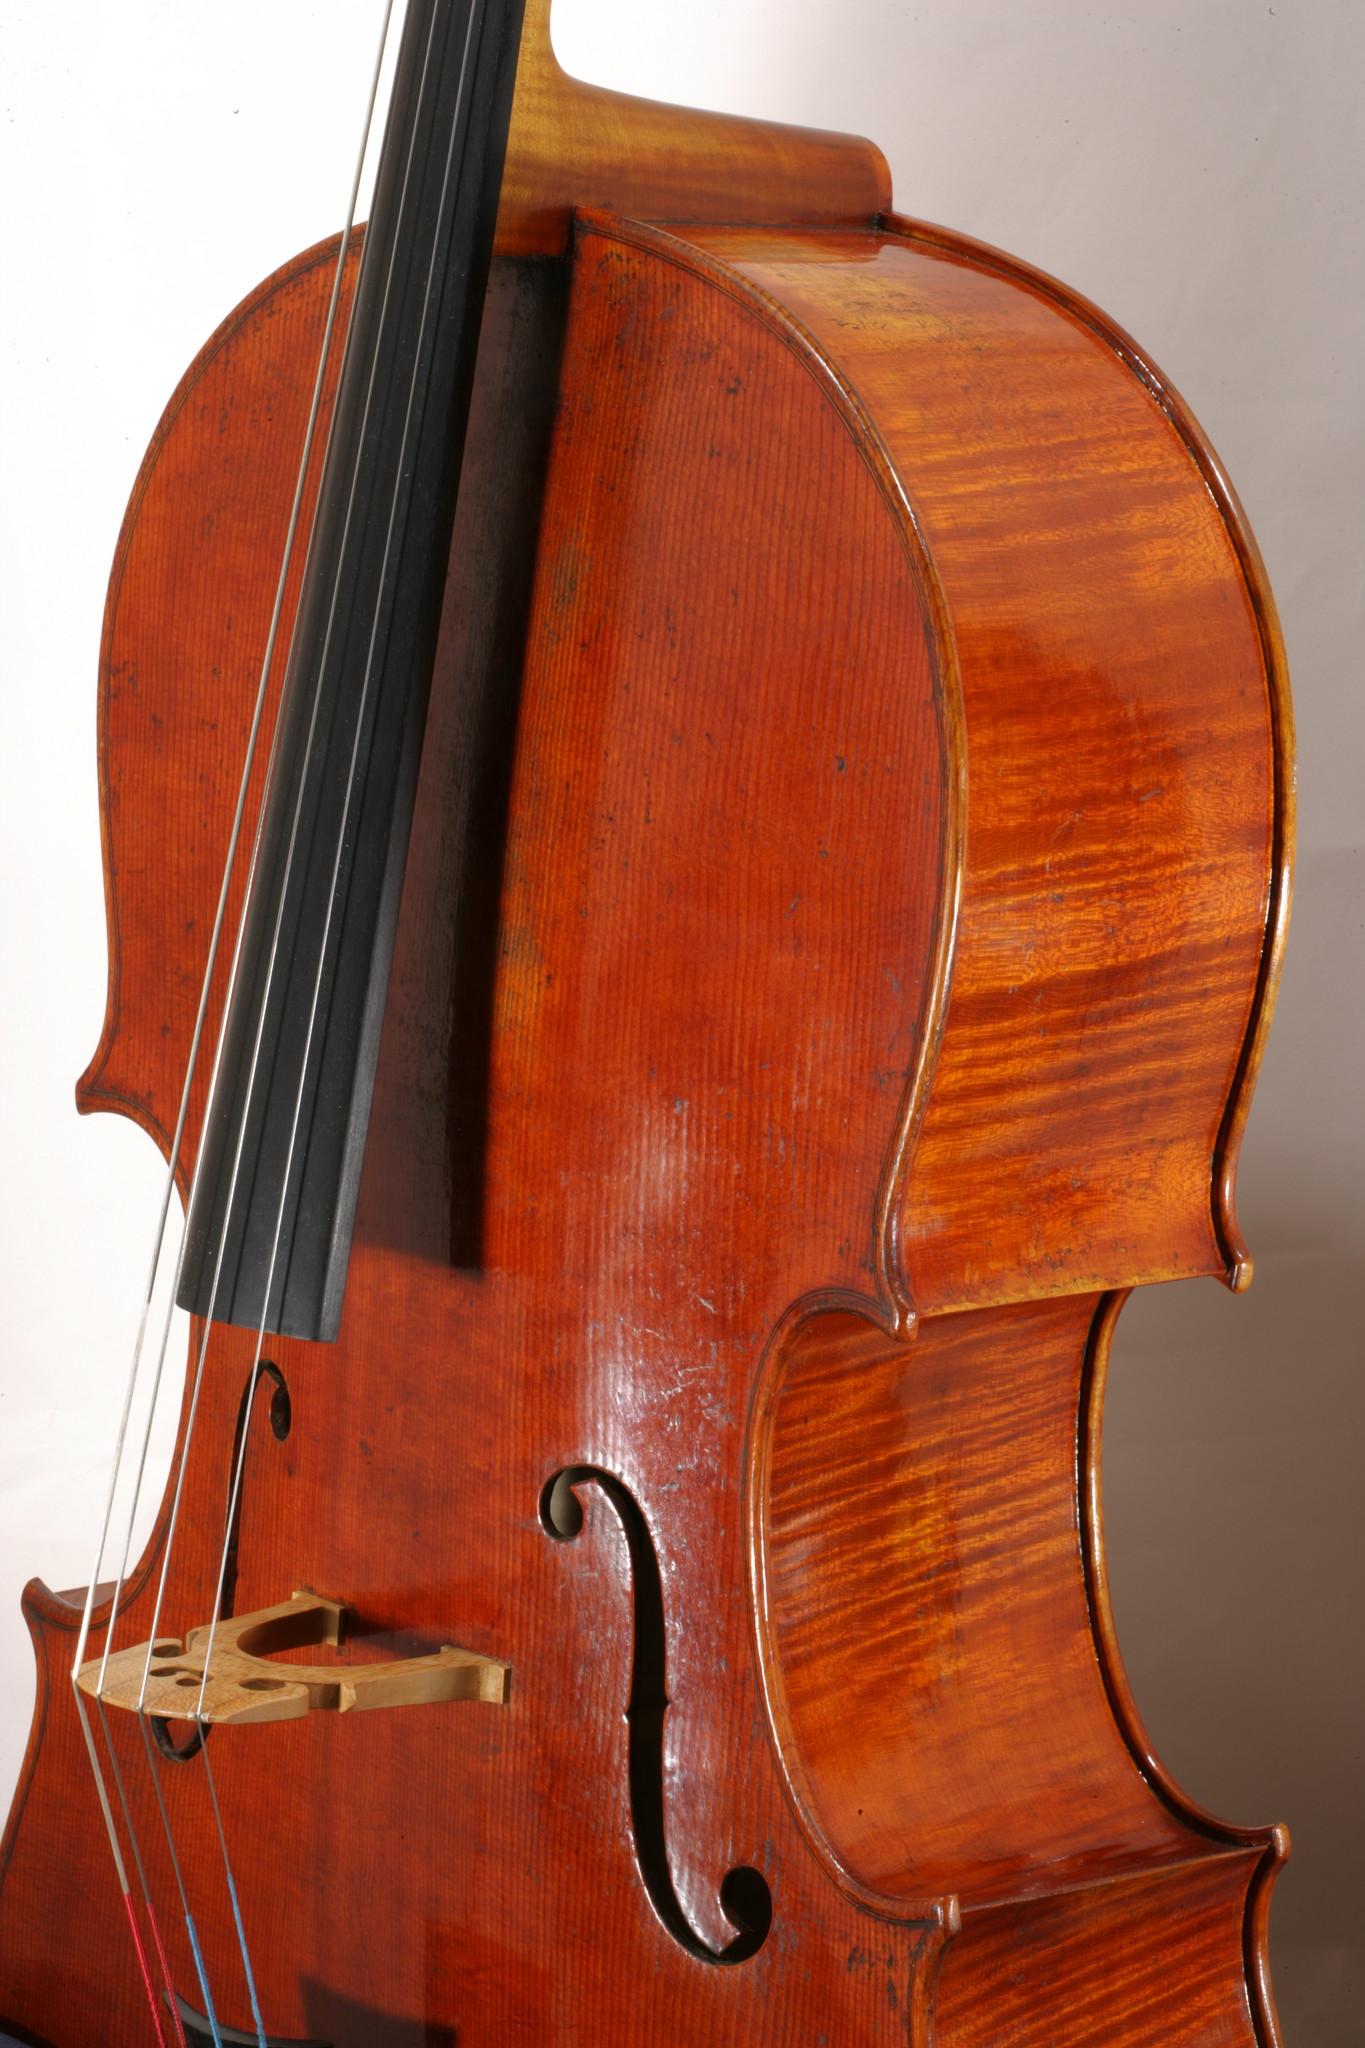 Joseph Grubaugh & Sigrun Seifert cello, Petaluma, CA 2019